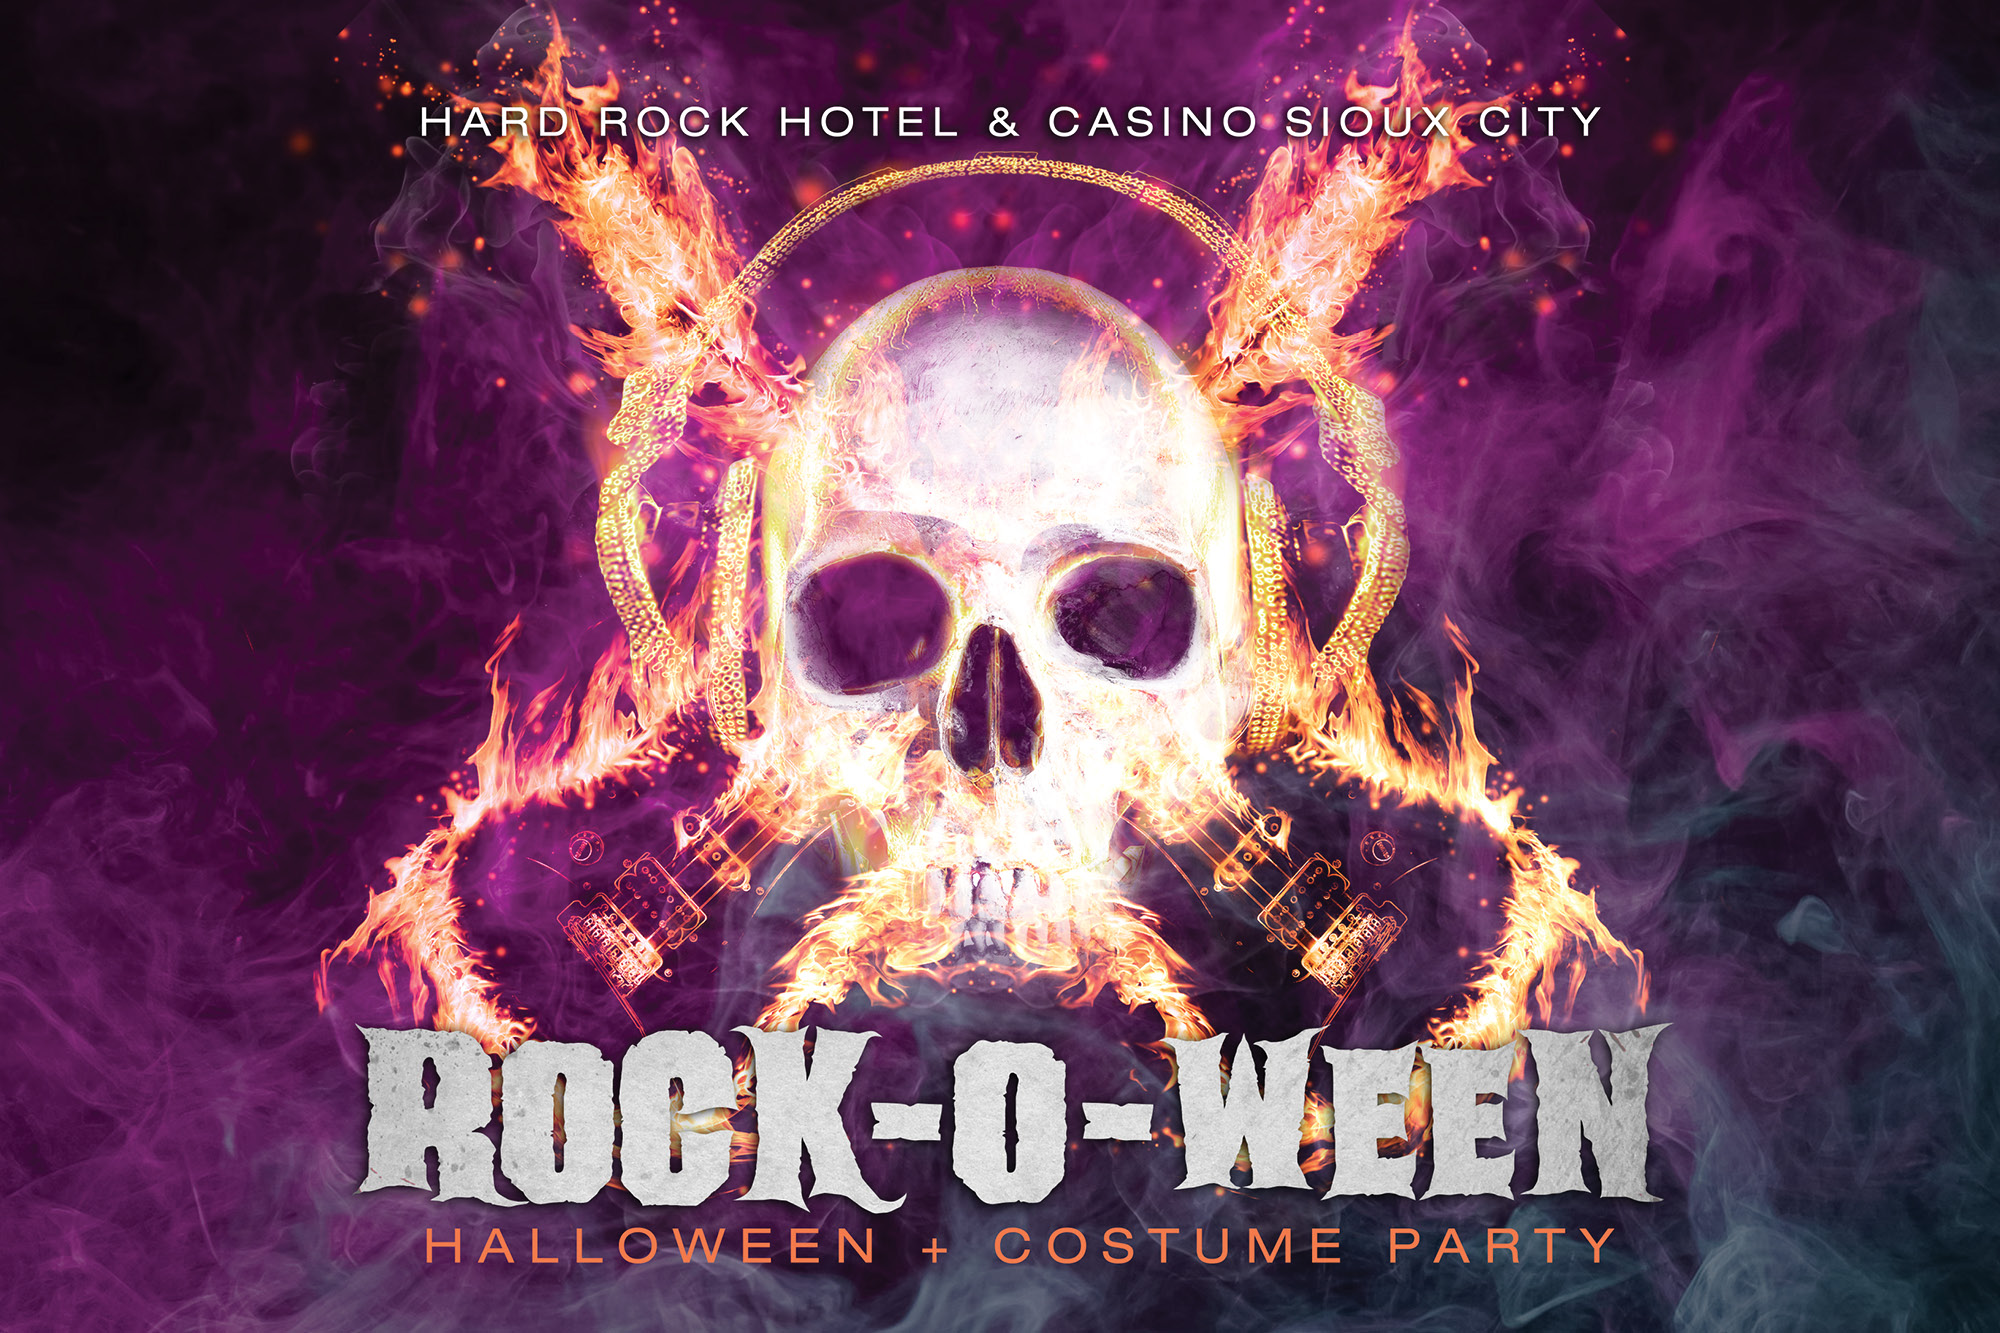 rock_o_week_halloween_costume_party